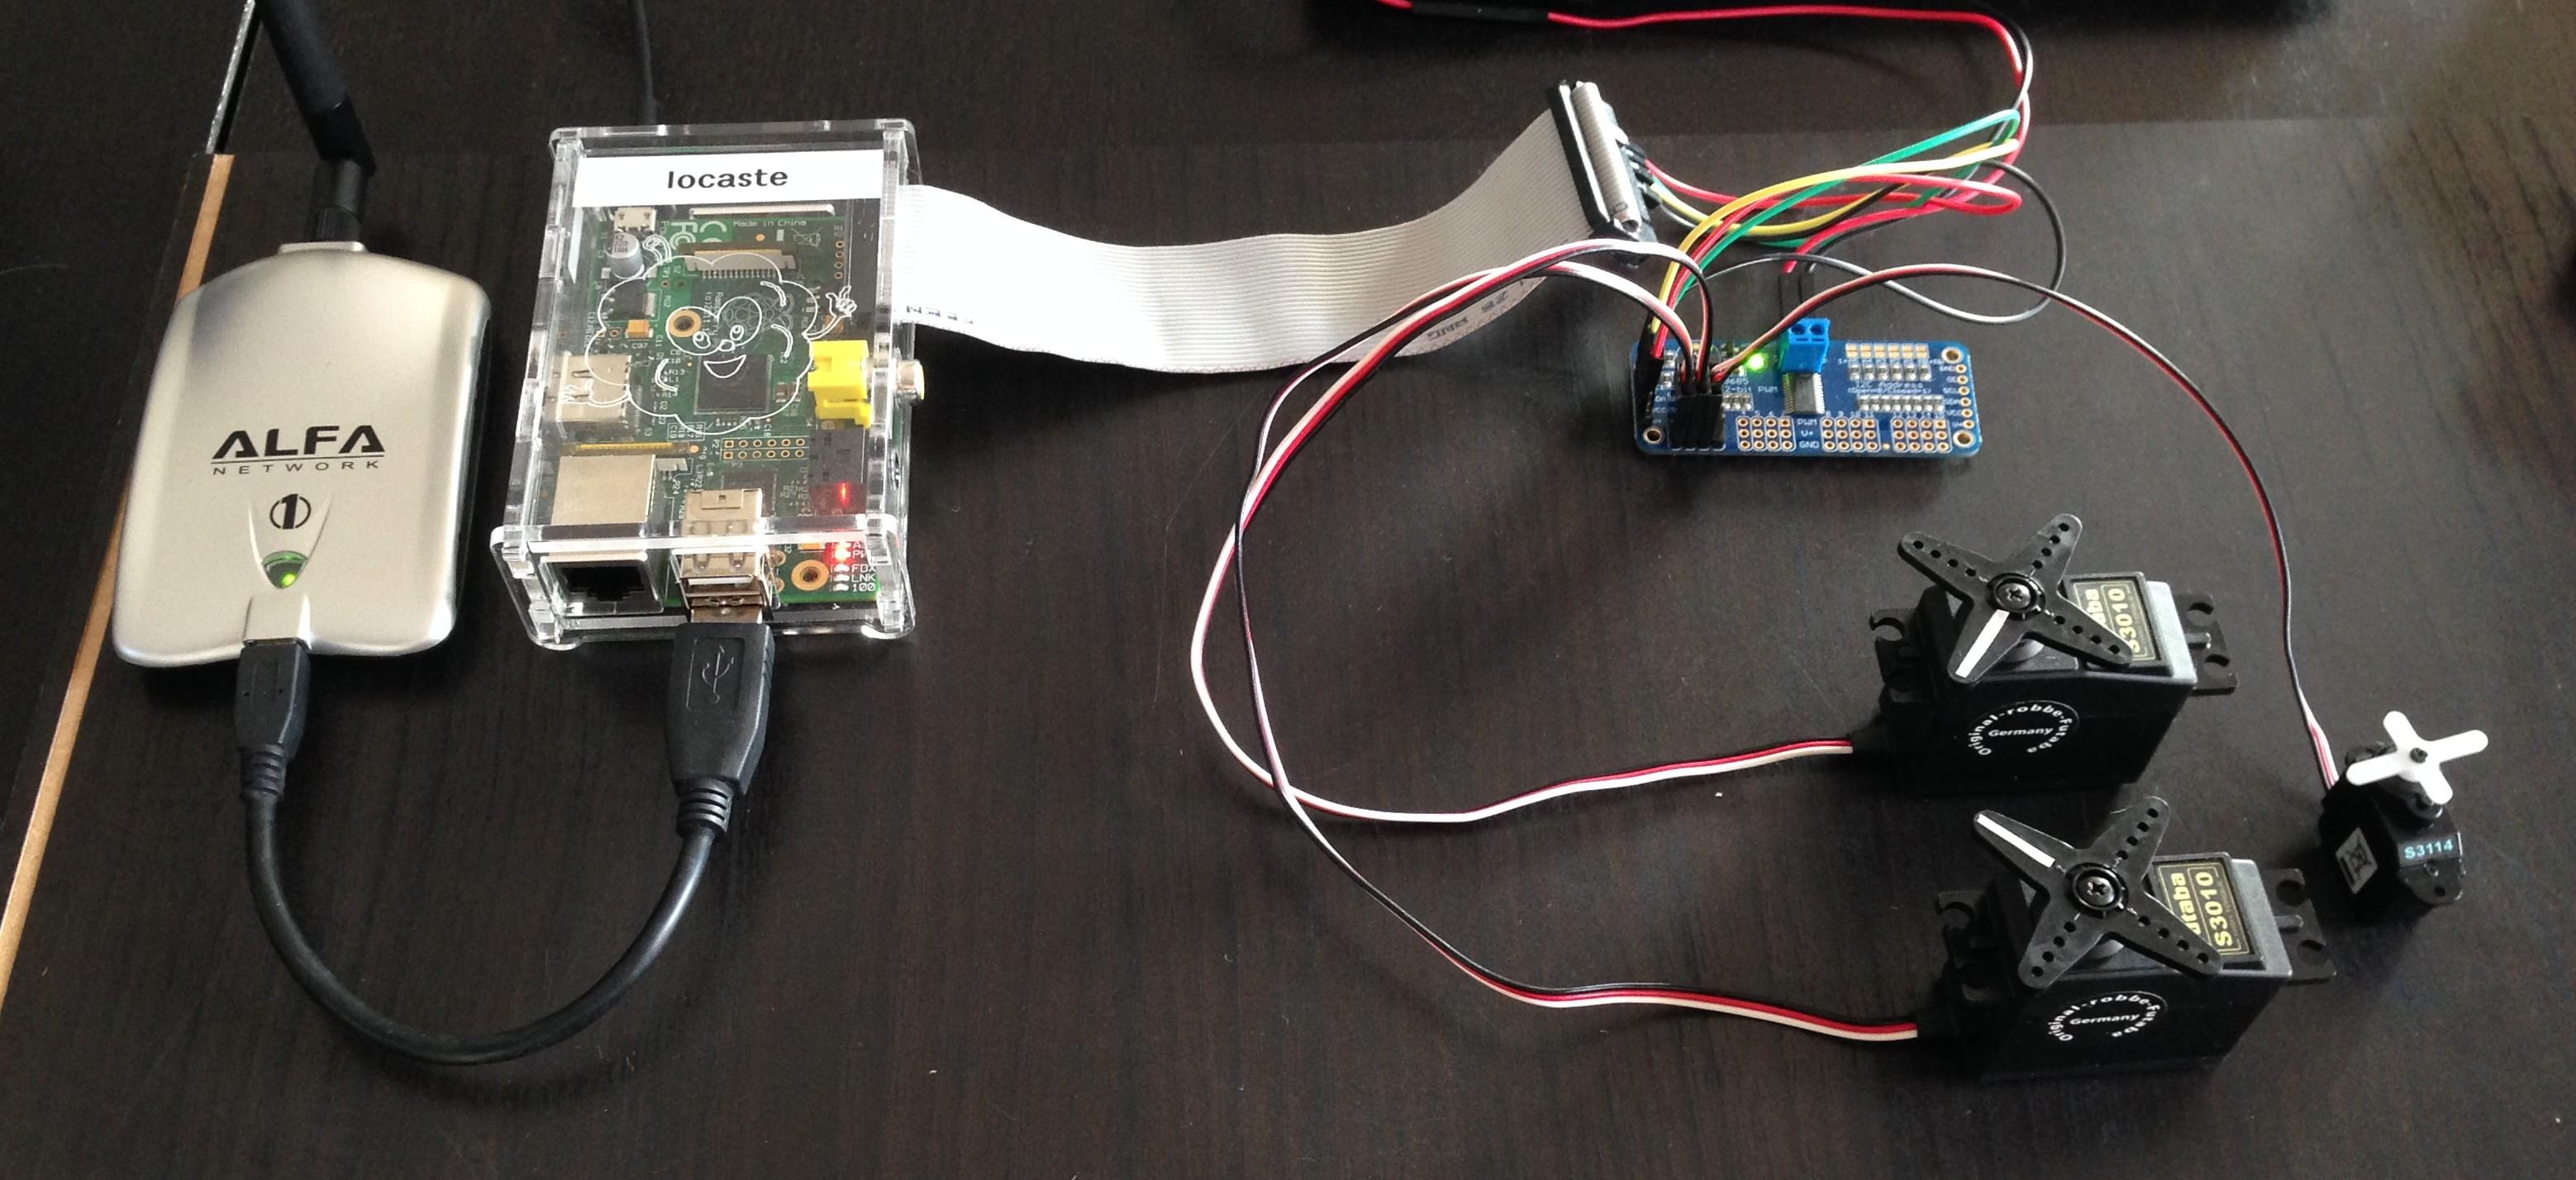 gpio - servos moteurs  joypad et wifi